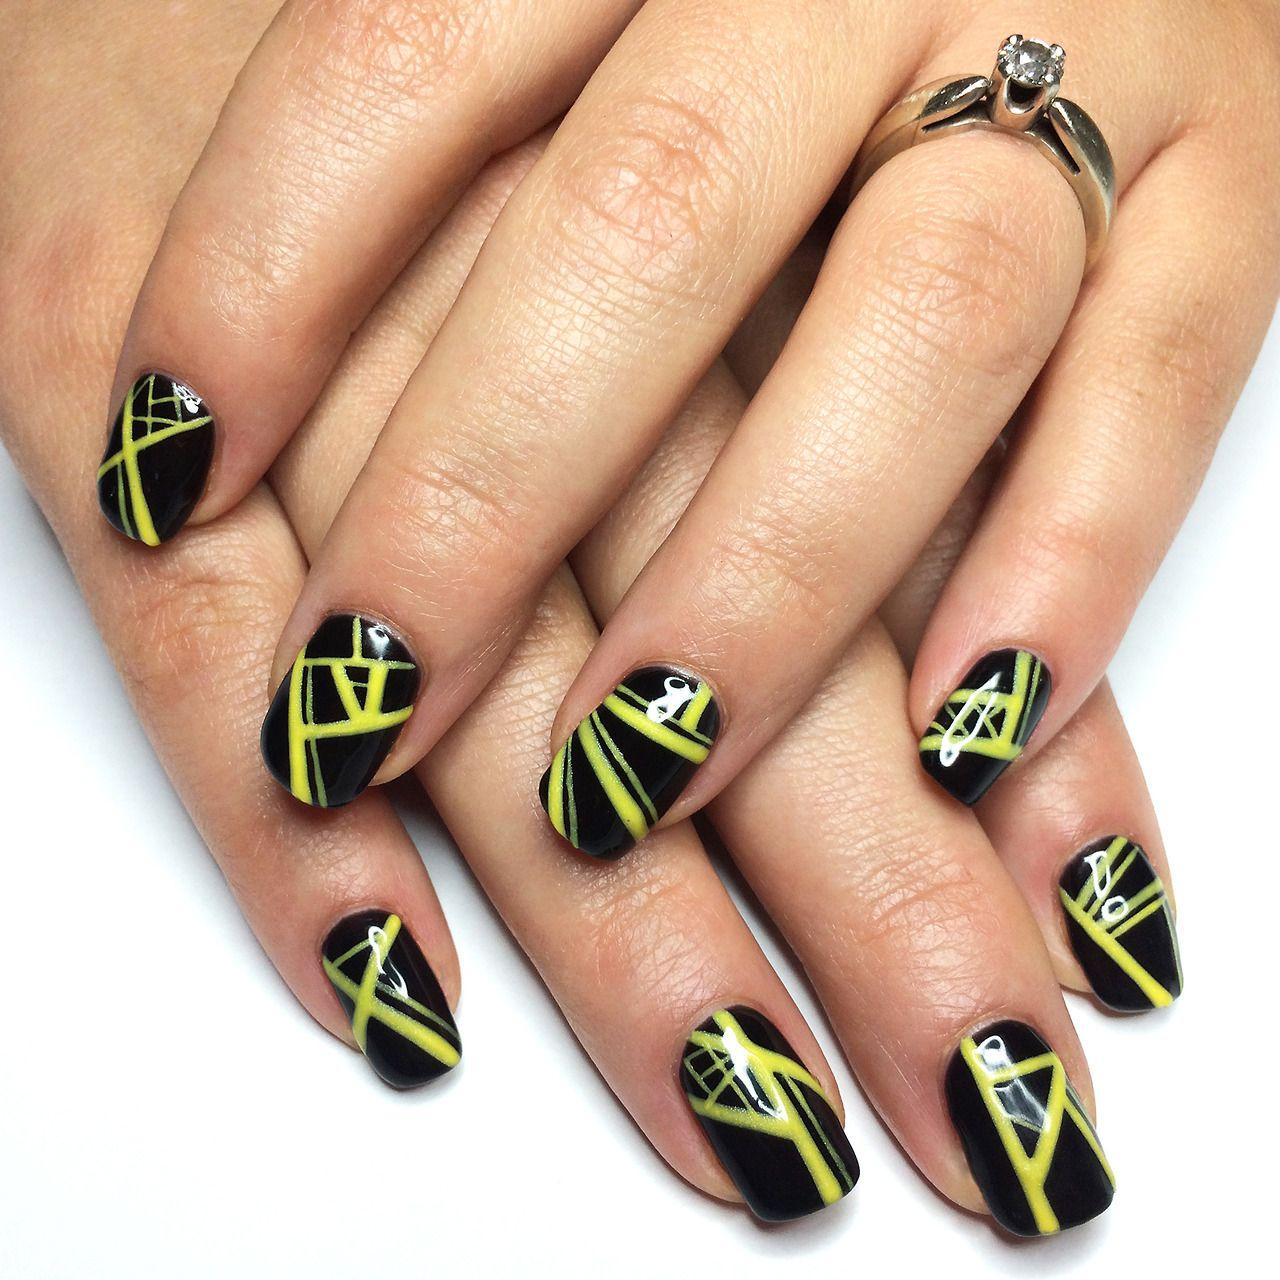 Httpbakeneko Nail Art 2 Pinterest Appointments